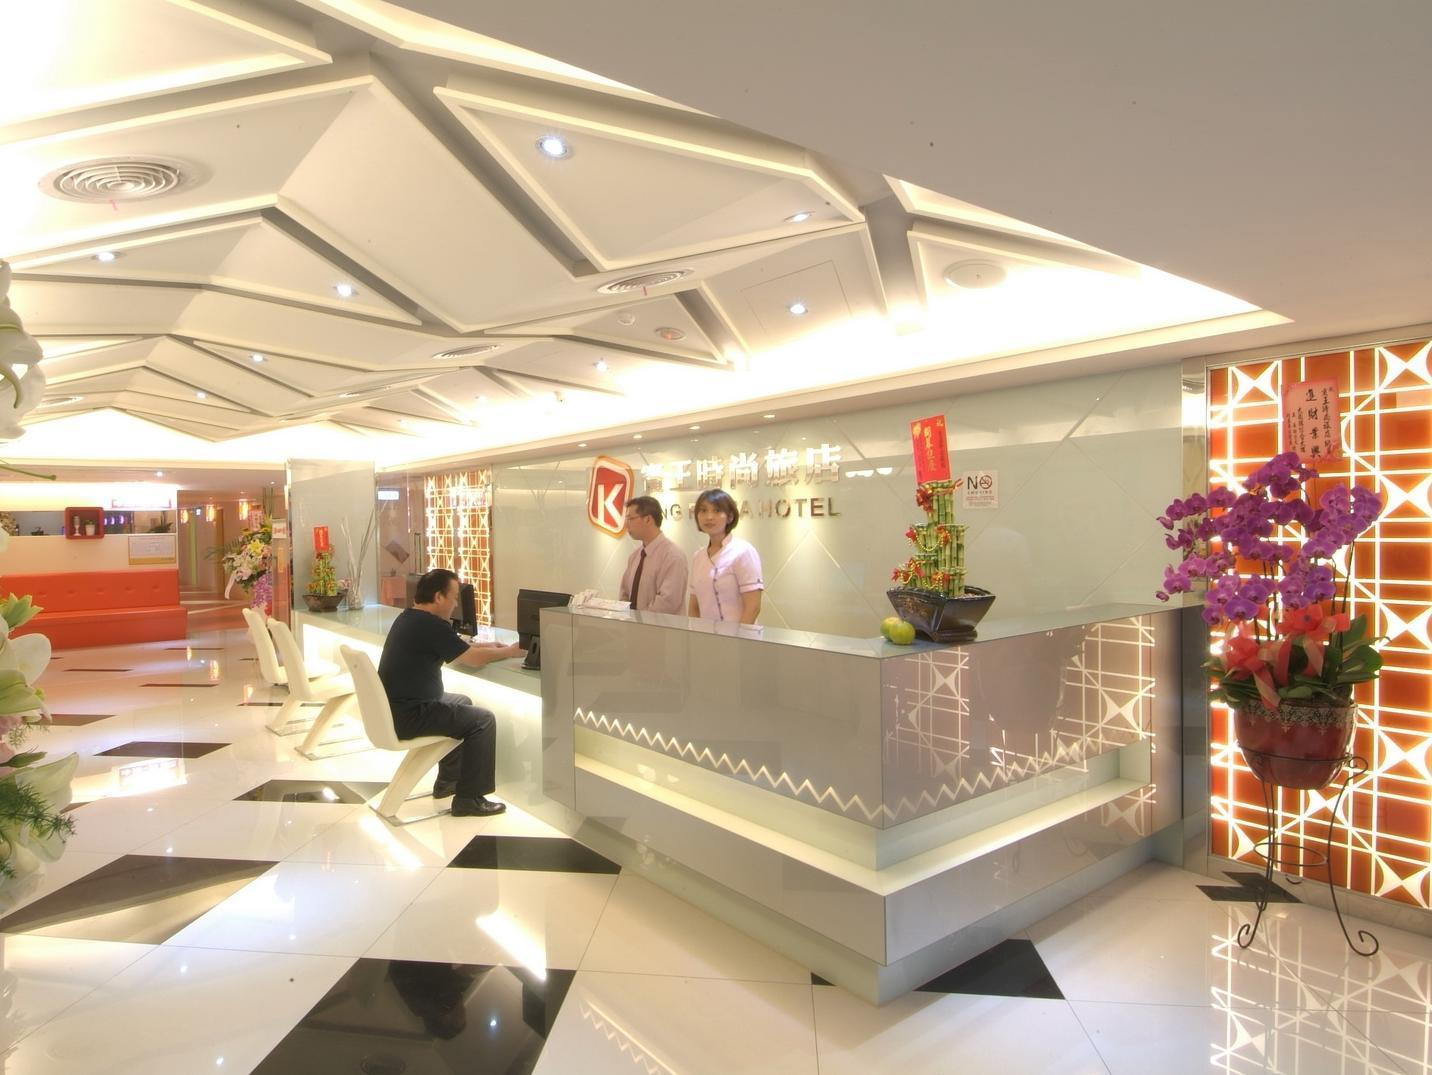 King Plaza Hotel